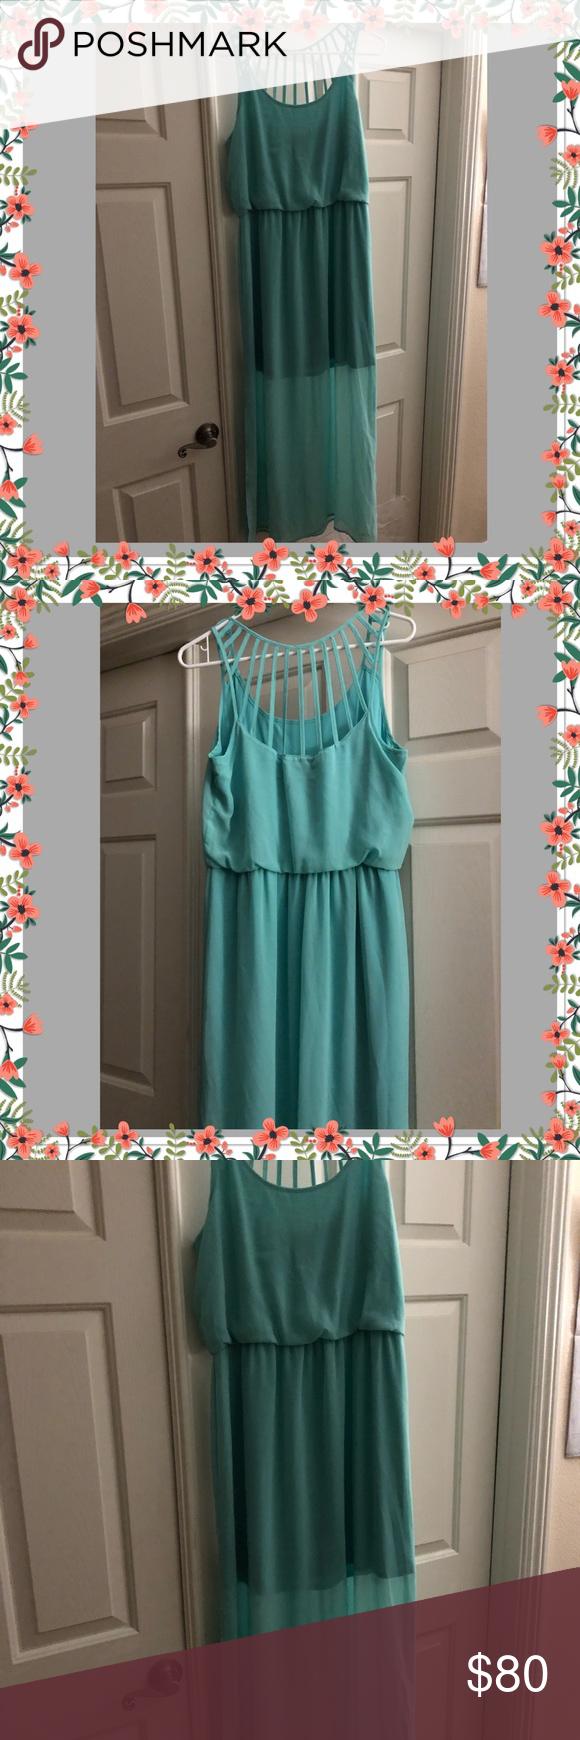 Reduced Beautiful Light Teal Green Dress Teal Green